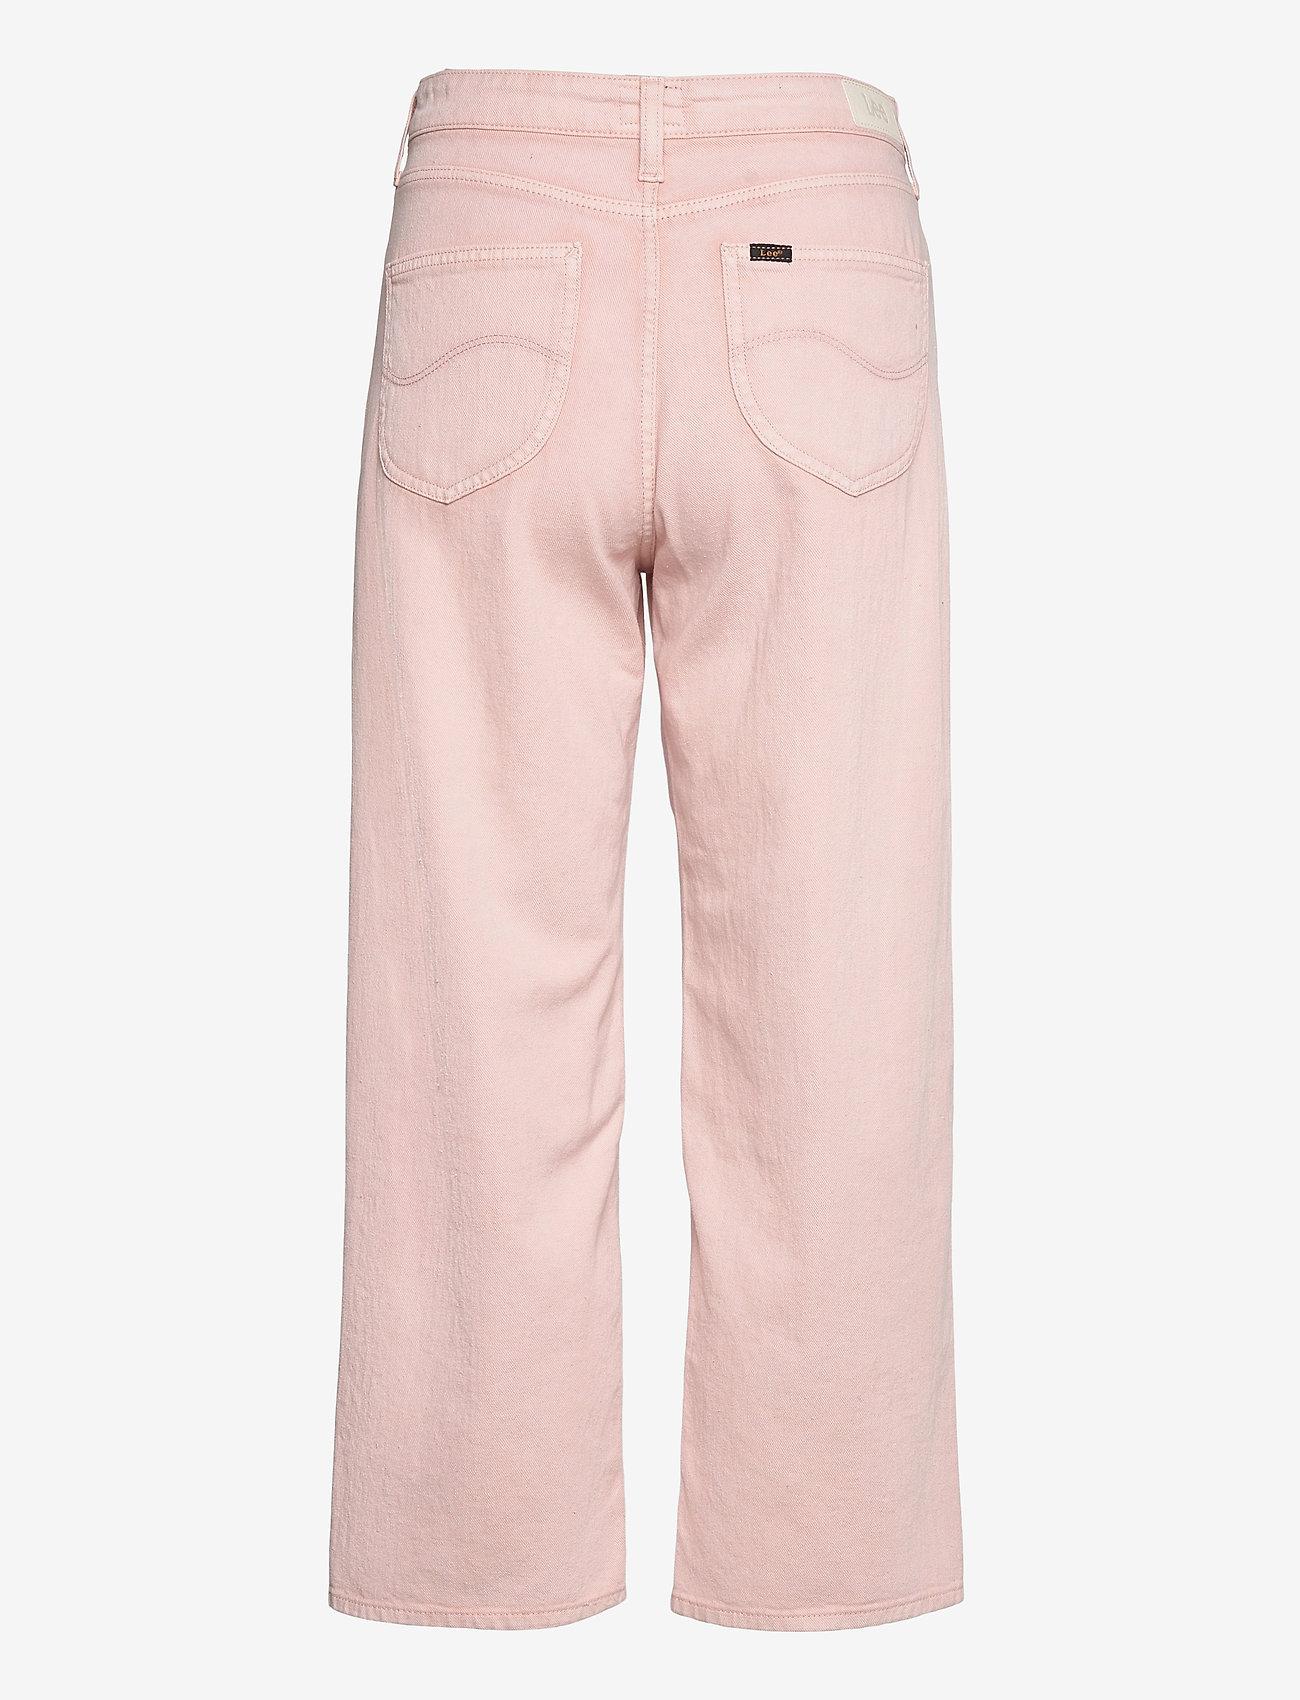 Lee Jeans - WIDE LEG - brede jeans - dark marlow - 1